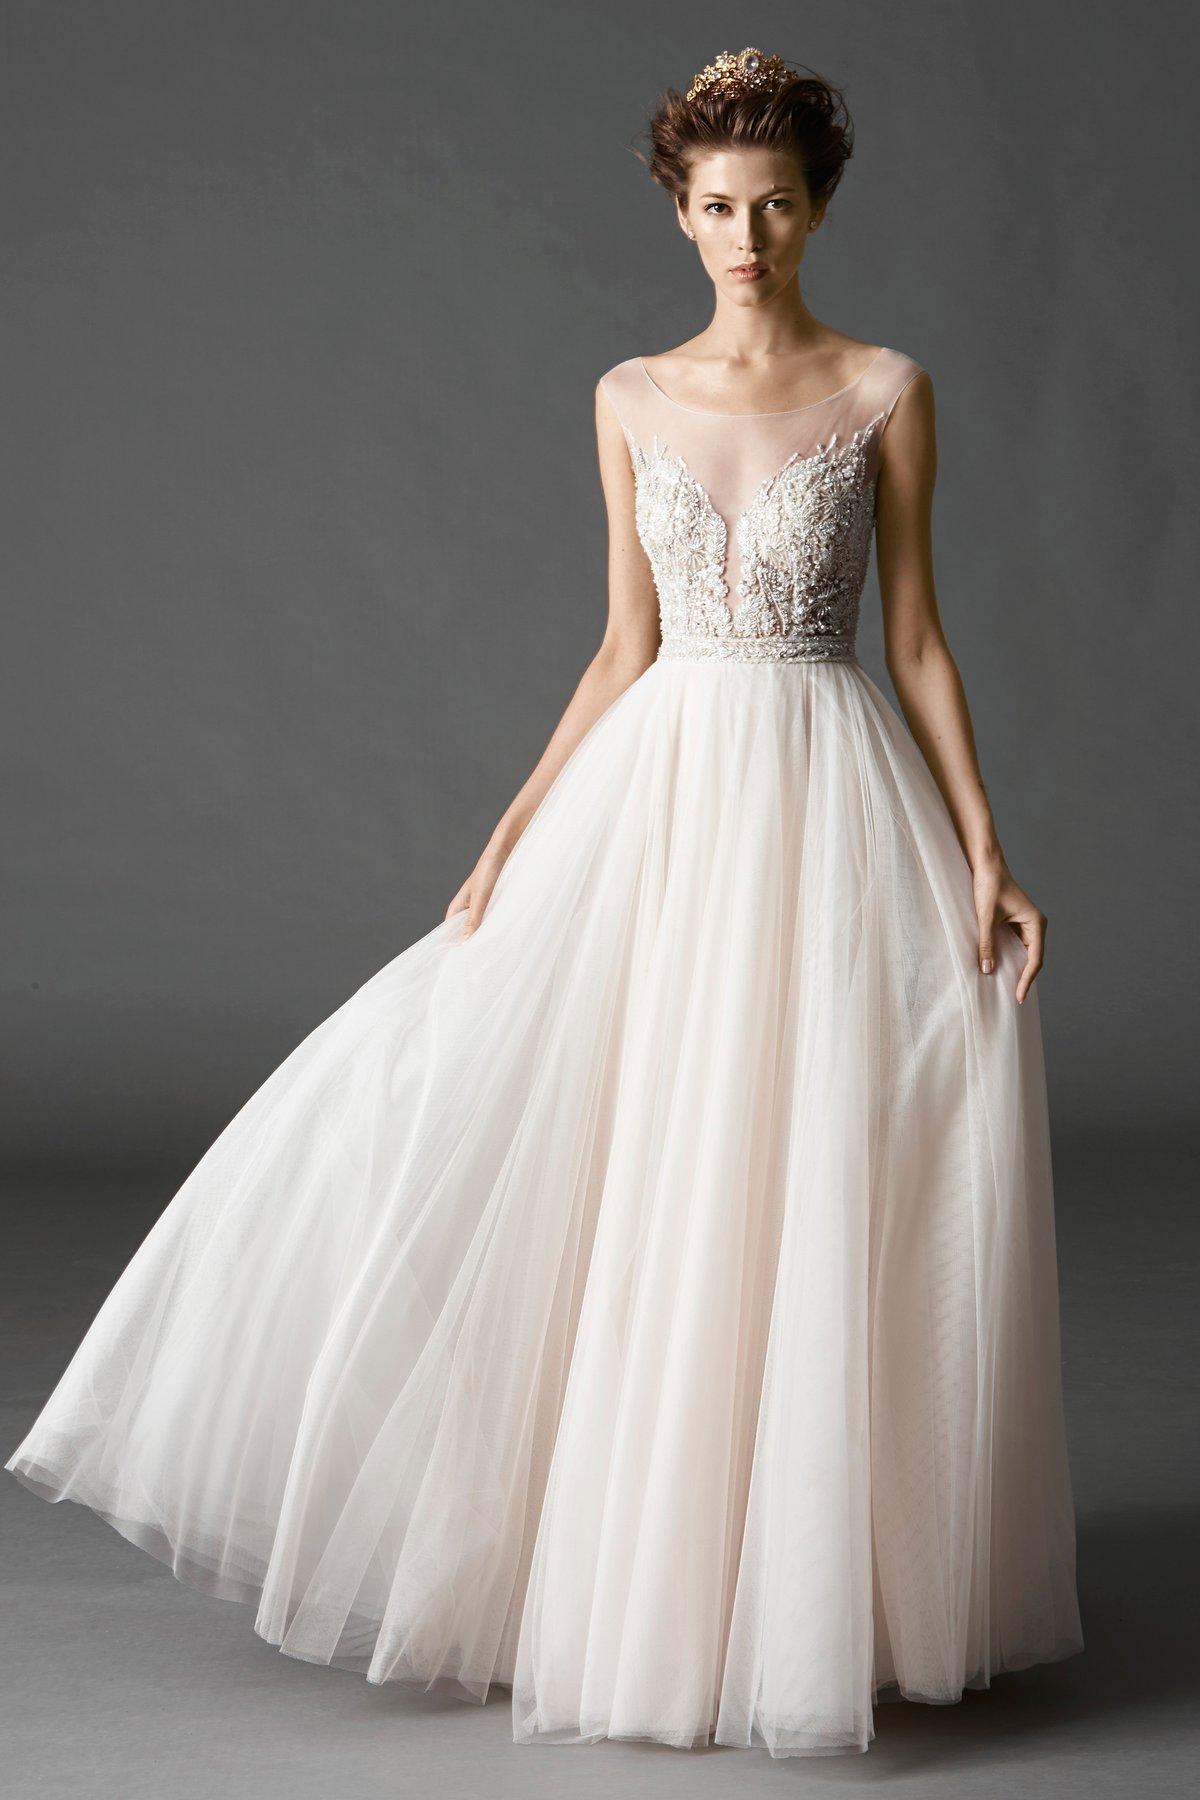 Kaliah 7082B | Watters Brides | Watters